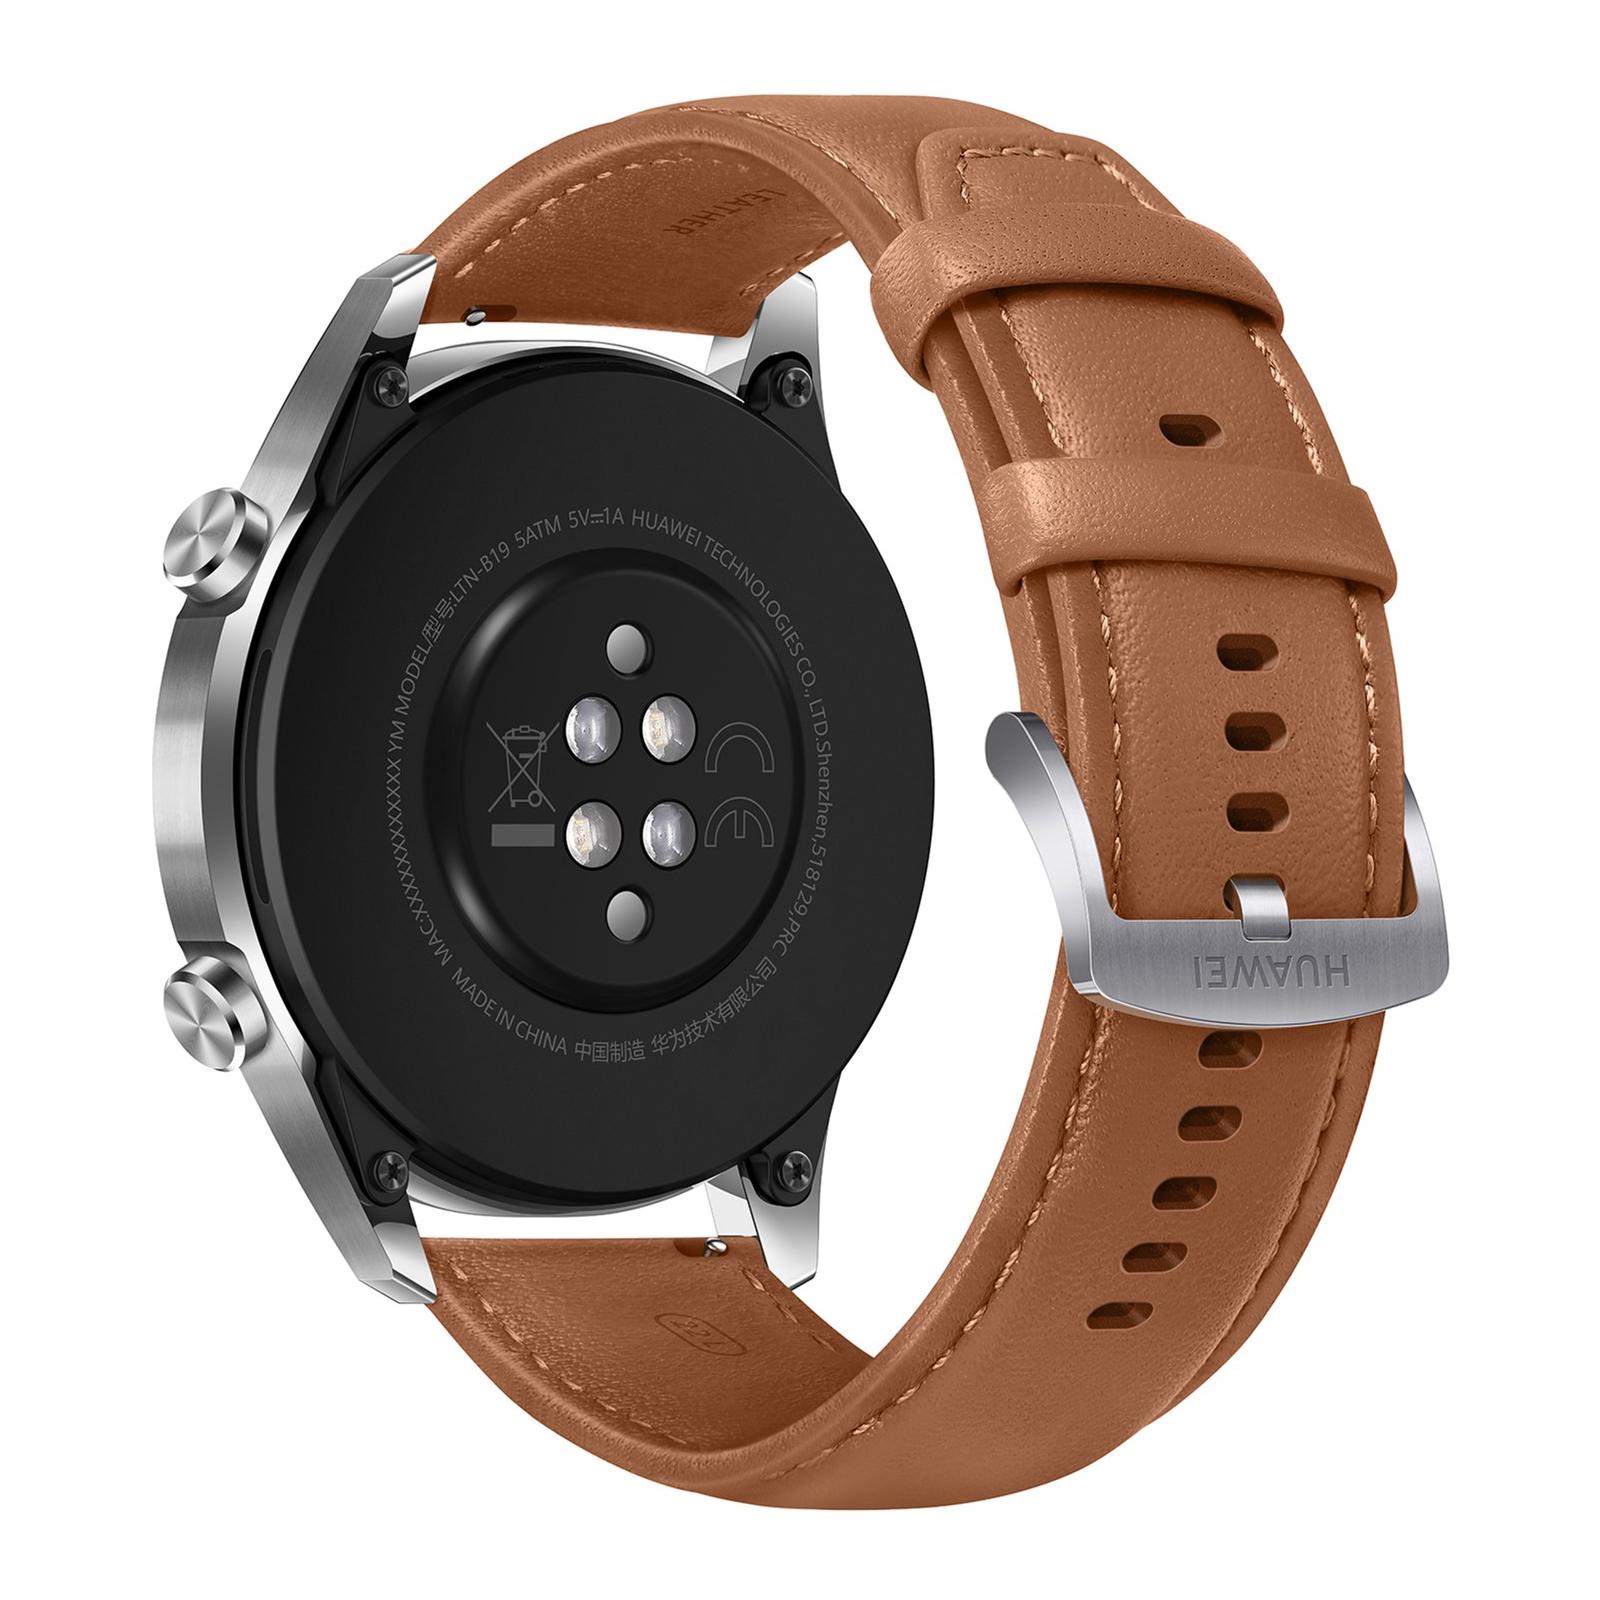 Смарт-часы Huawei Watch GT 2 46mm Classic Silver BROWN шкіра (Latona-B19V) (55024470) изображение 4